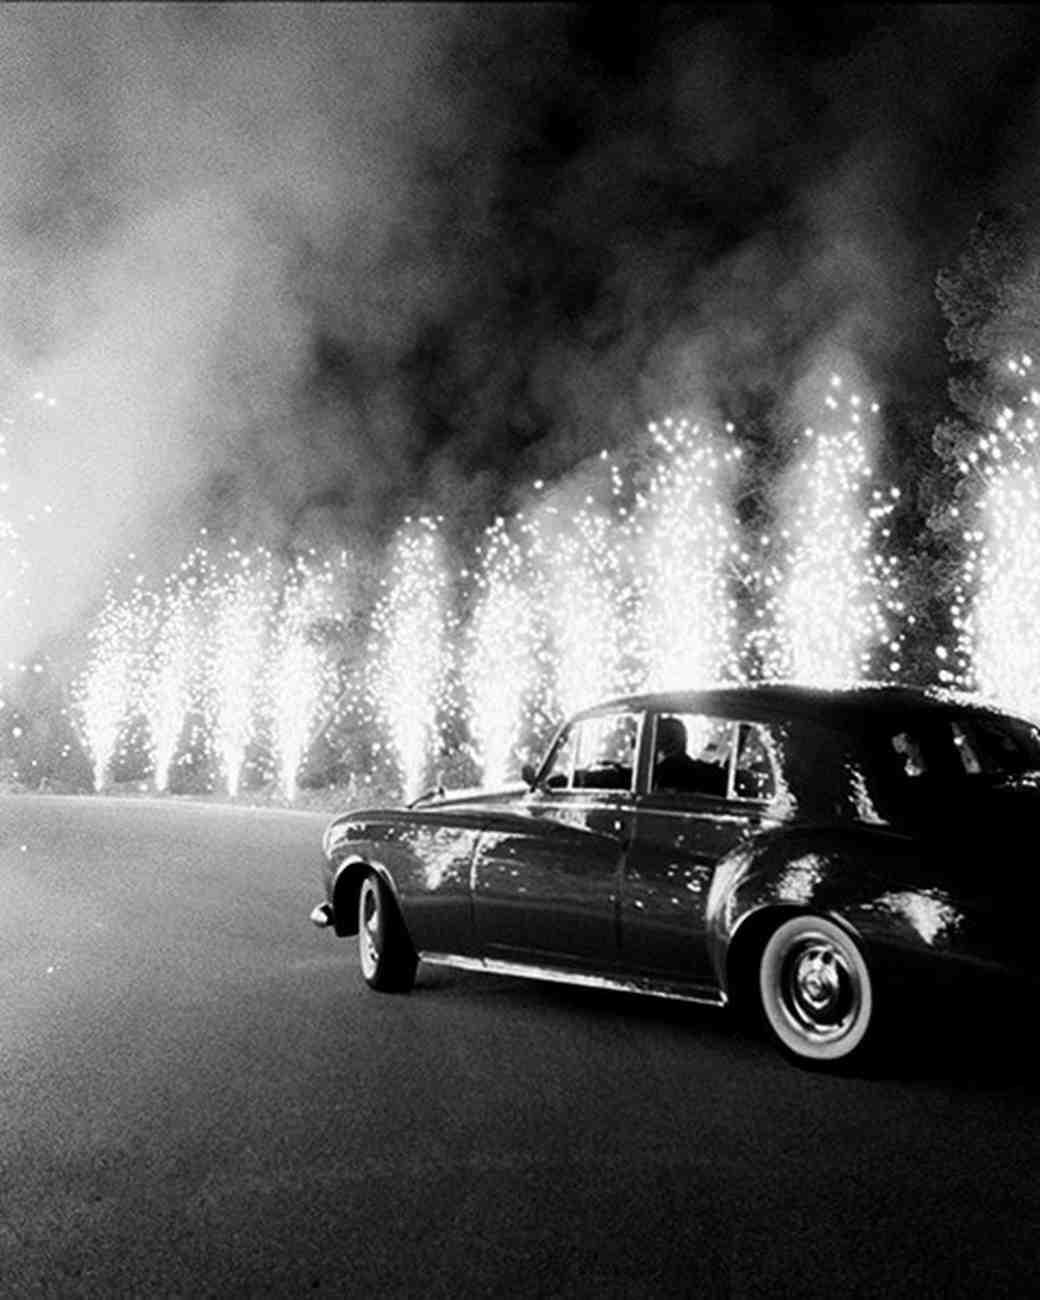 night wedding idea sparklers and a classic car